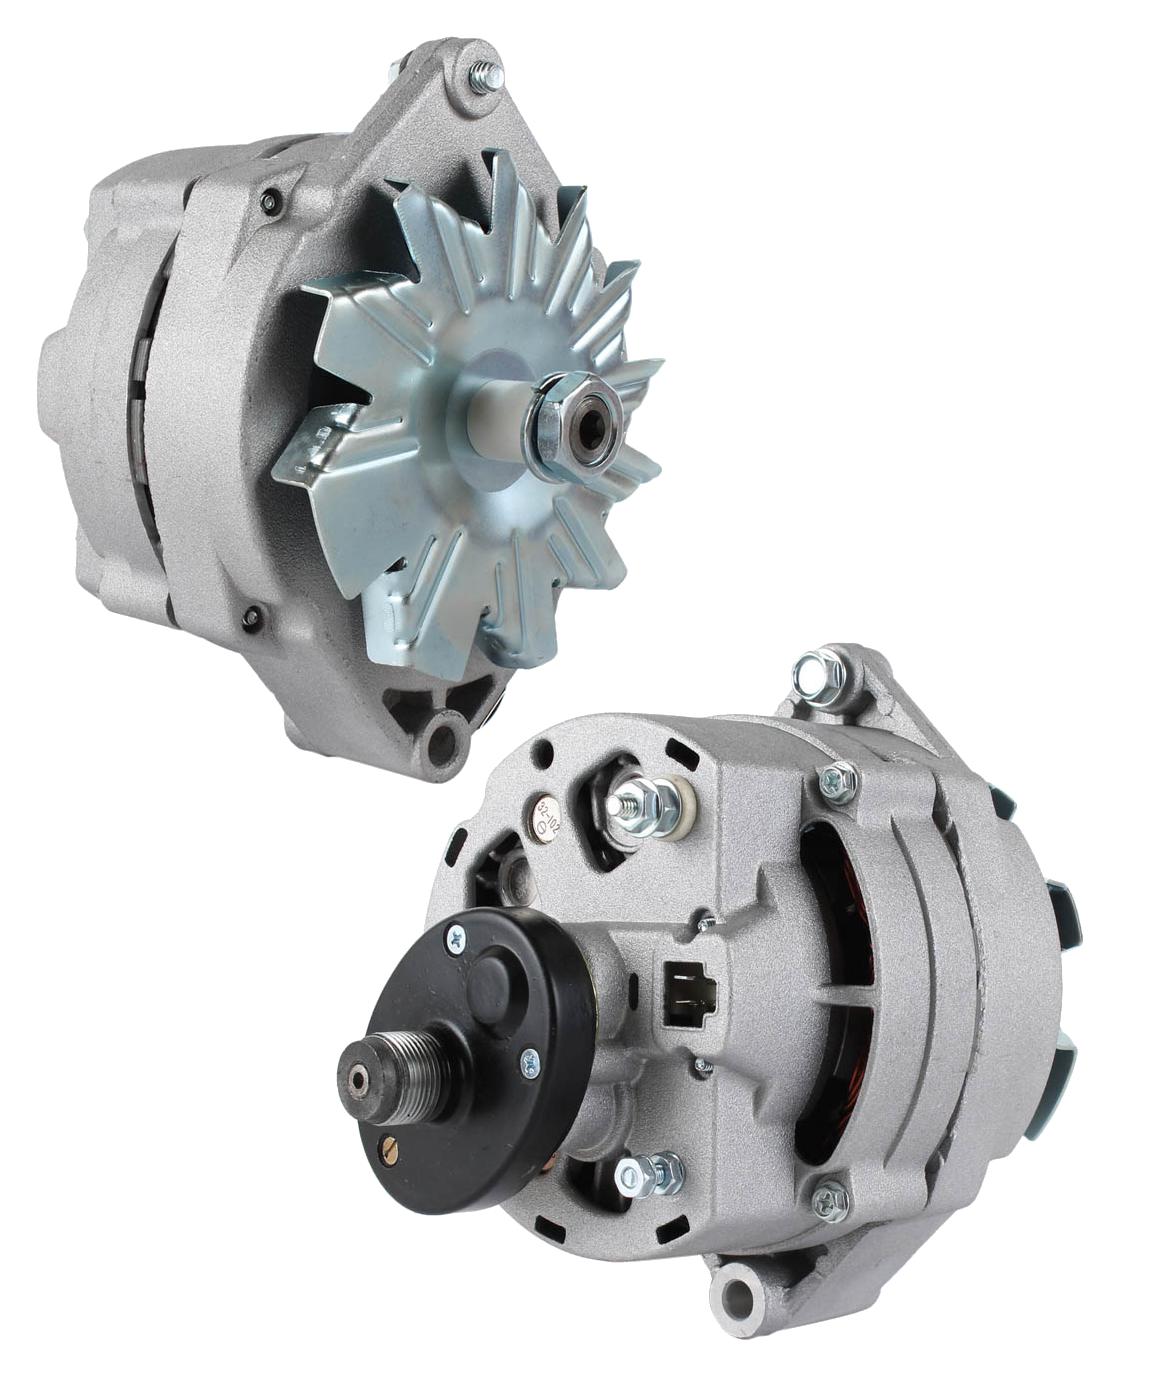 Delco Alternator Wiring Diagram Massey Ferguson 1080 With Tach Drive For 30 Rh Yesterdaystractors Com 165 50